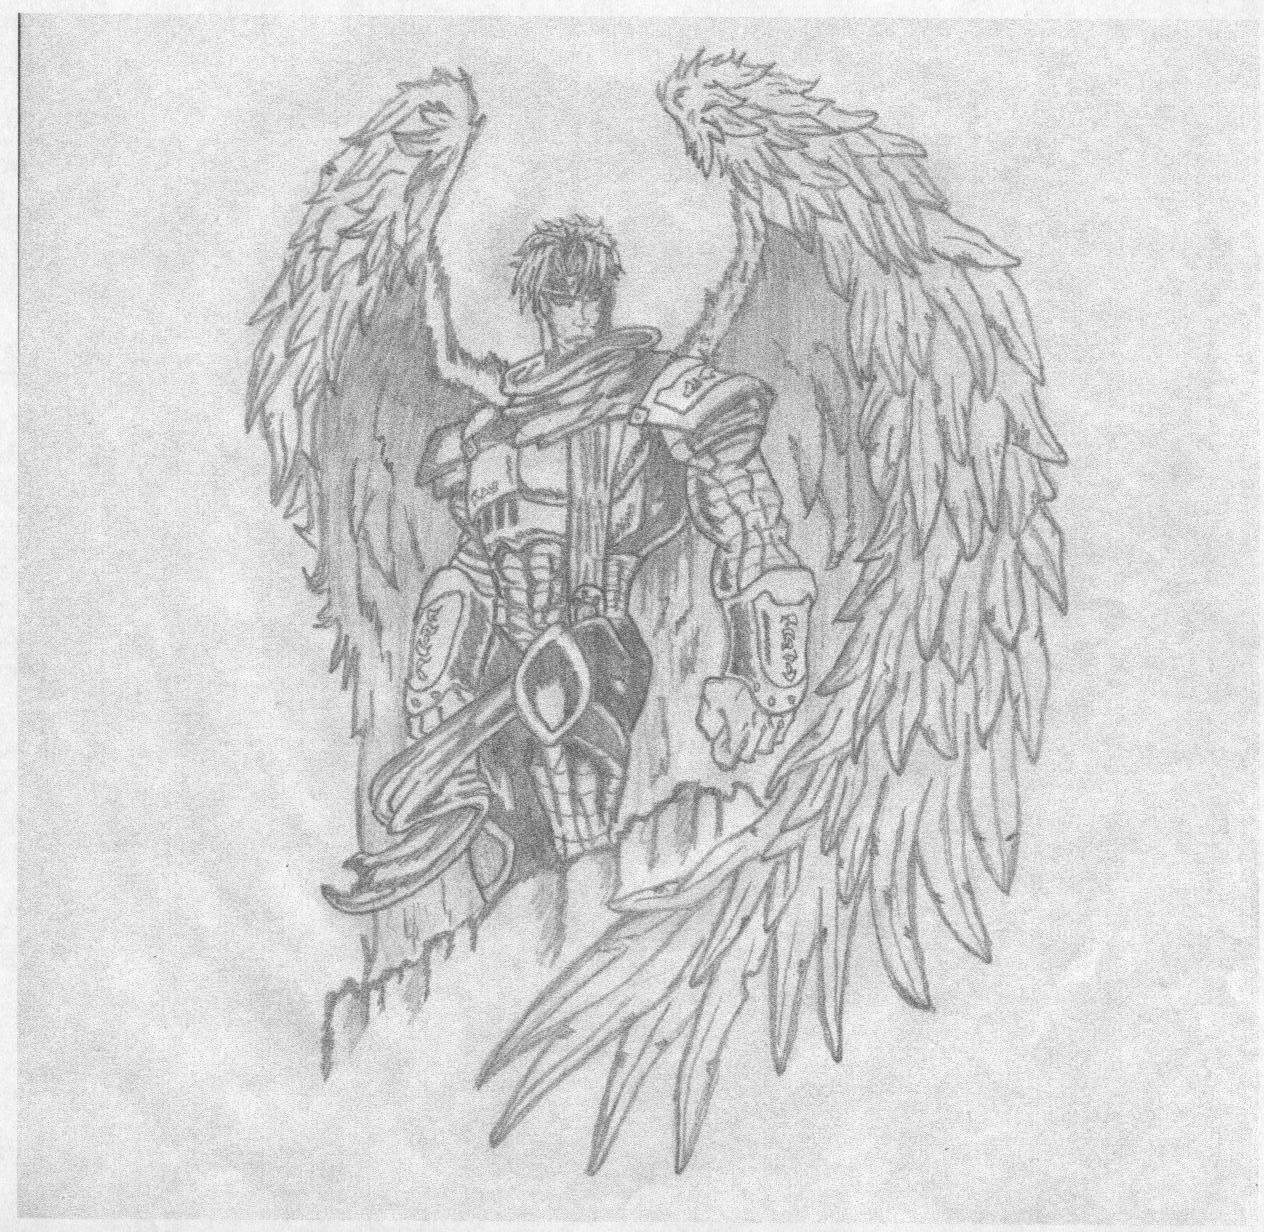 Рисованные архангелы